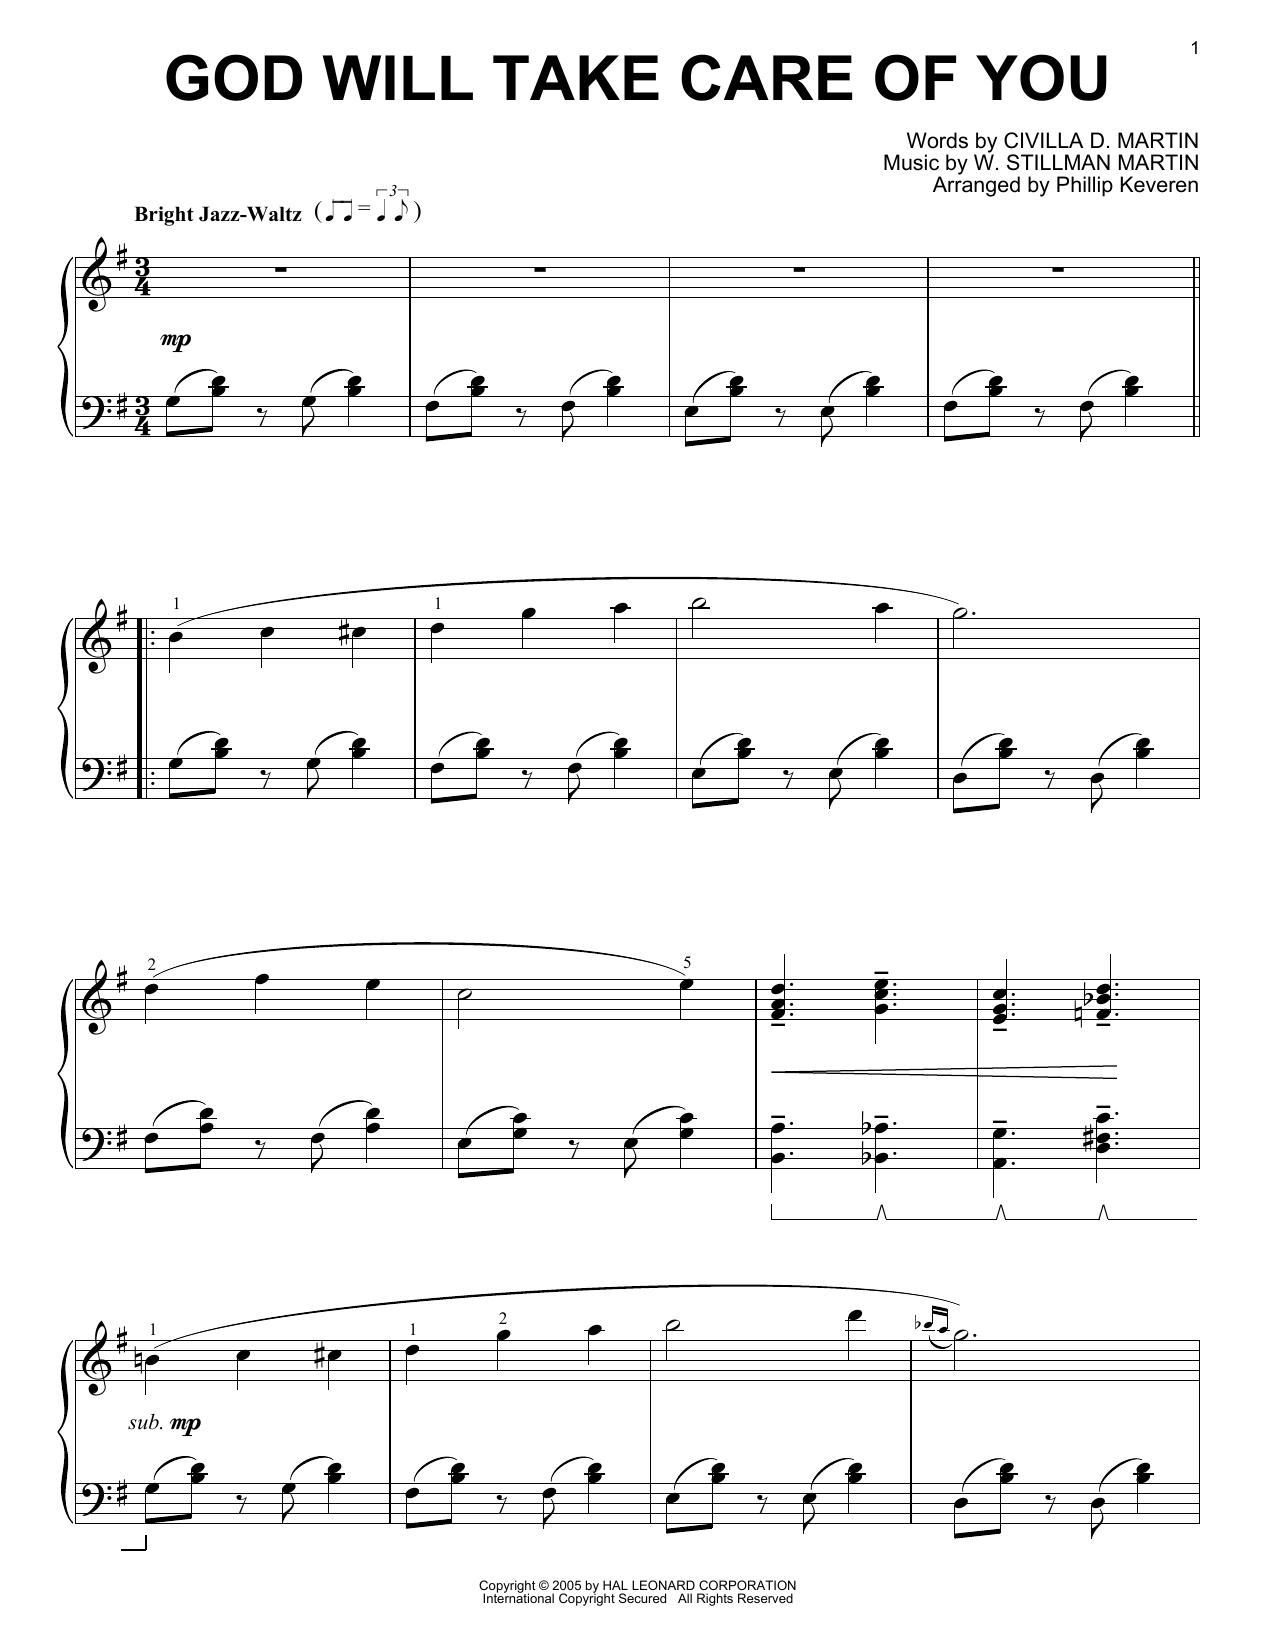 W. Stillman Martin God Will Take Care Of You [Jazz version] (arr. Phillip Keveren) sheet music notes printable PDF score